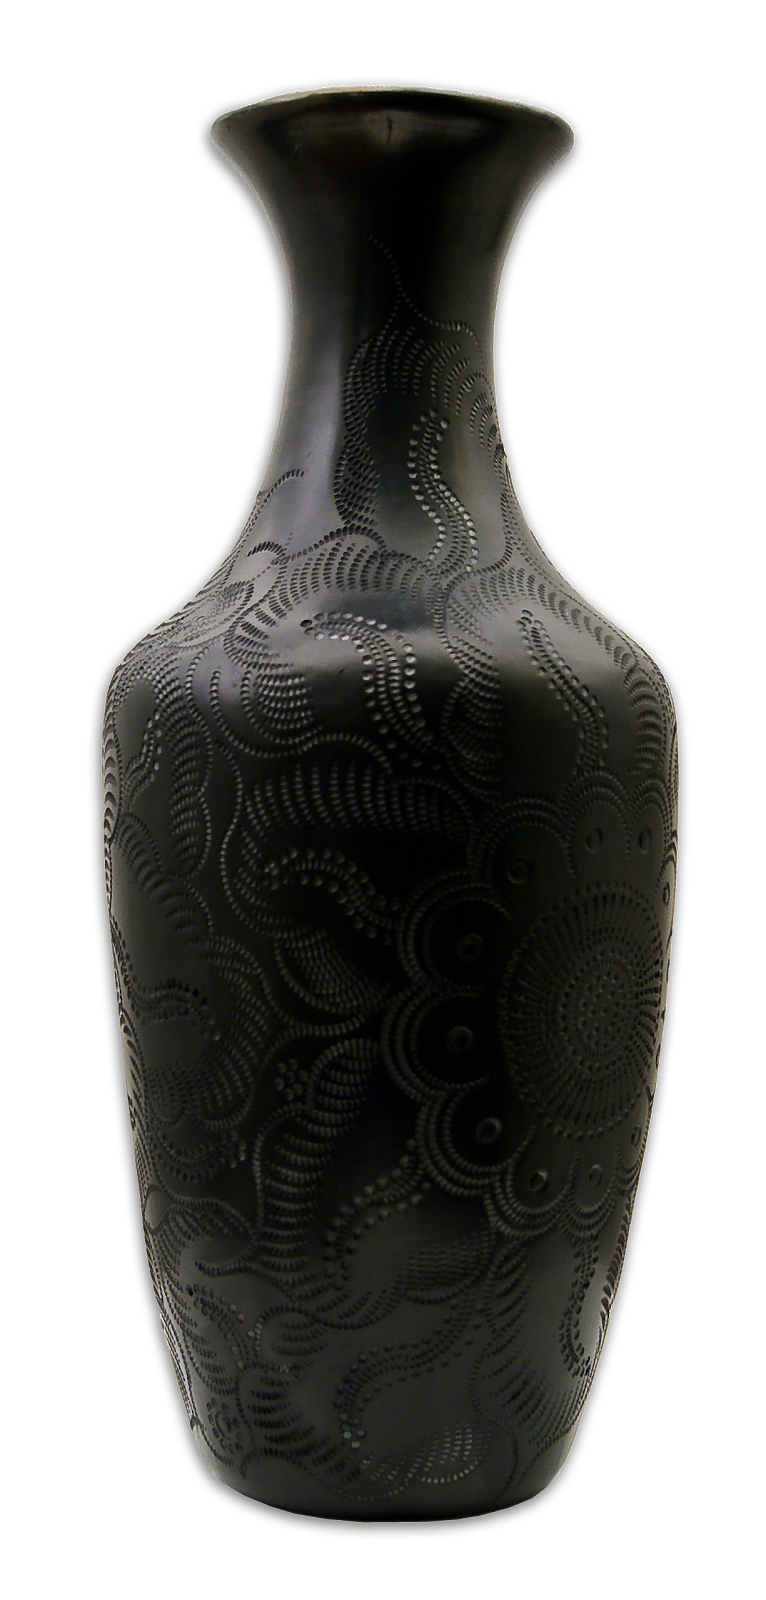 Vase PNG image free Download